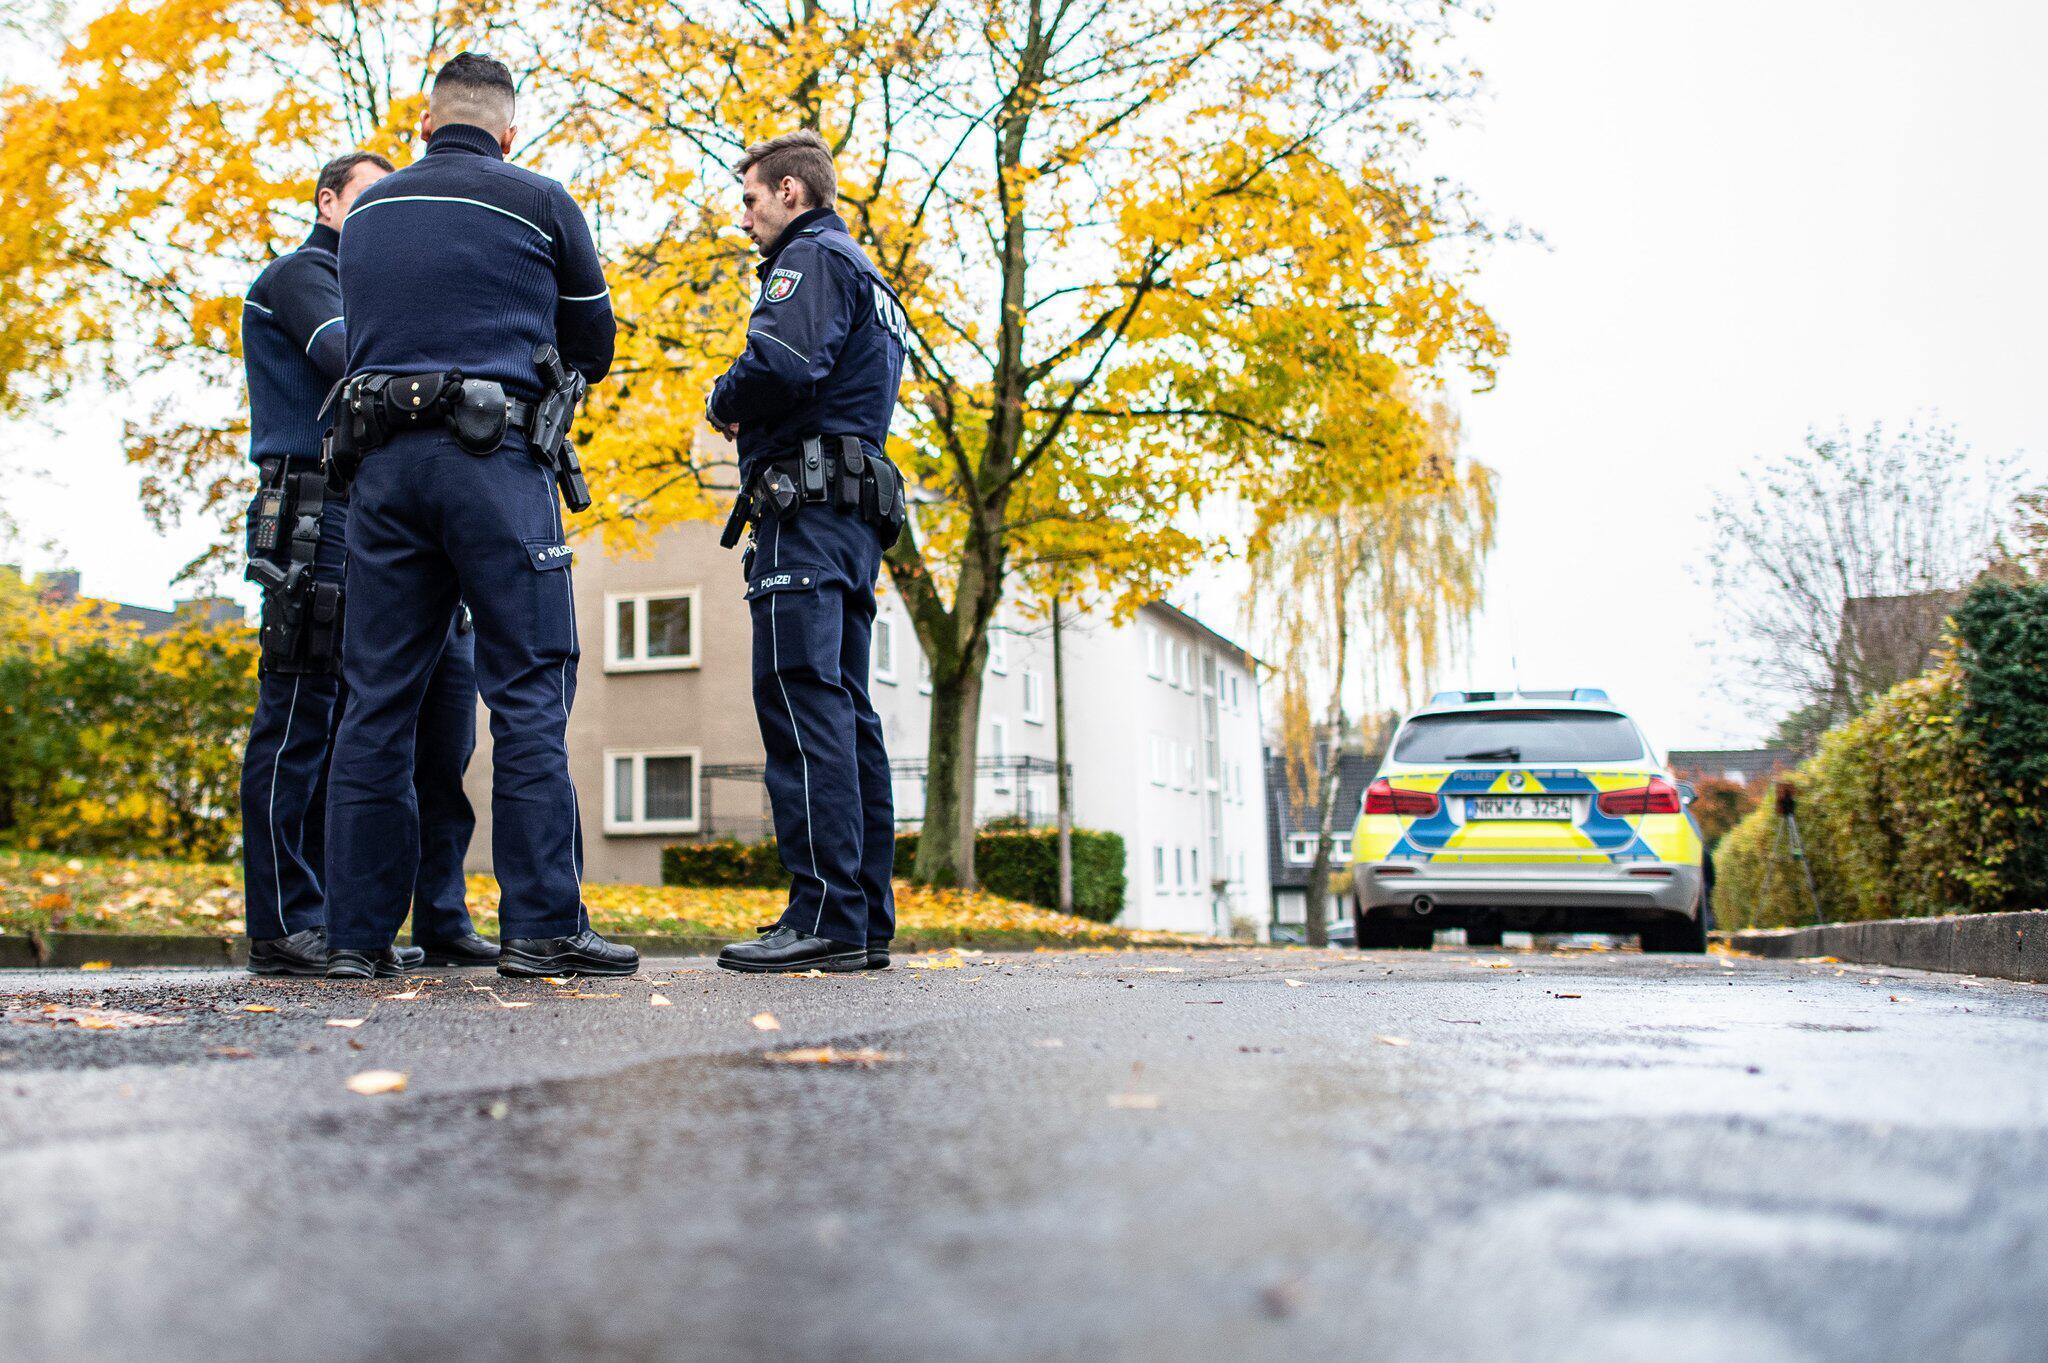 Bild zu A teenage girl accused of killing child in Germany